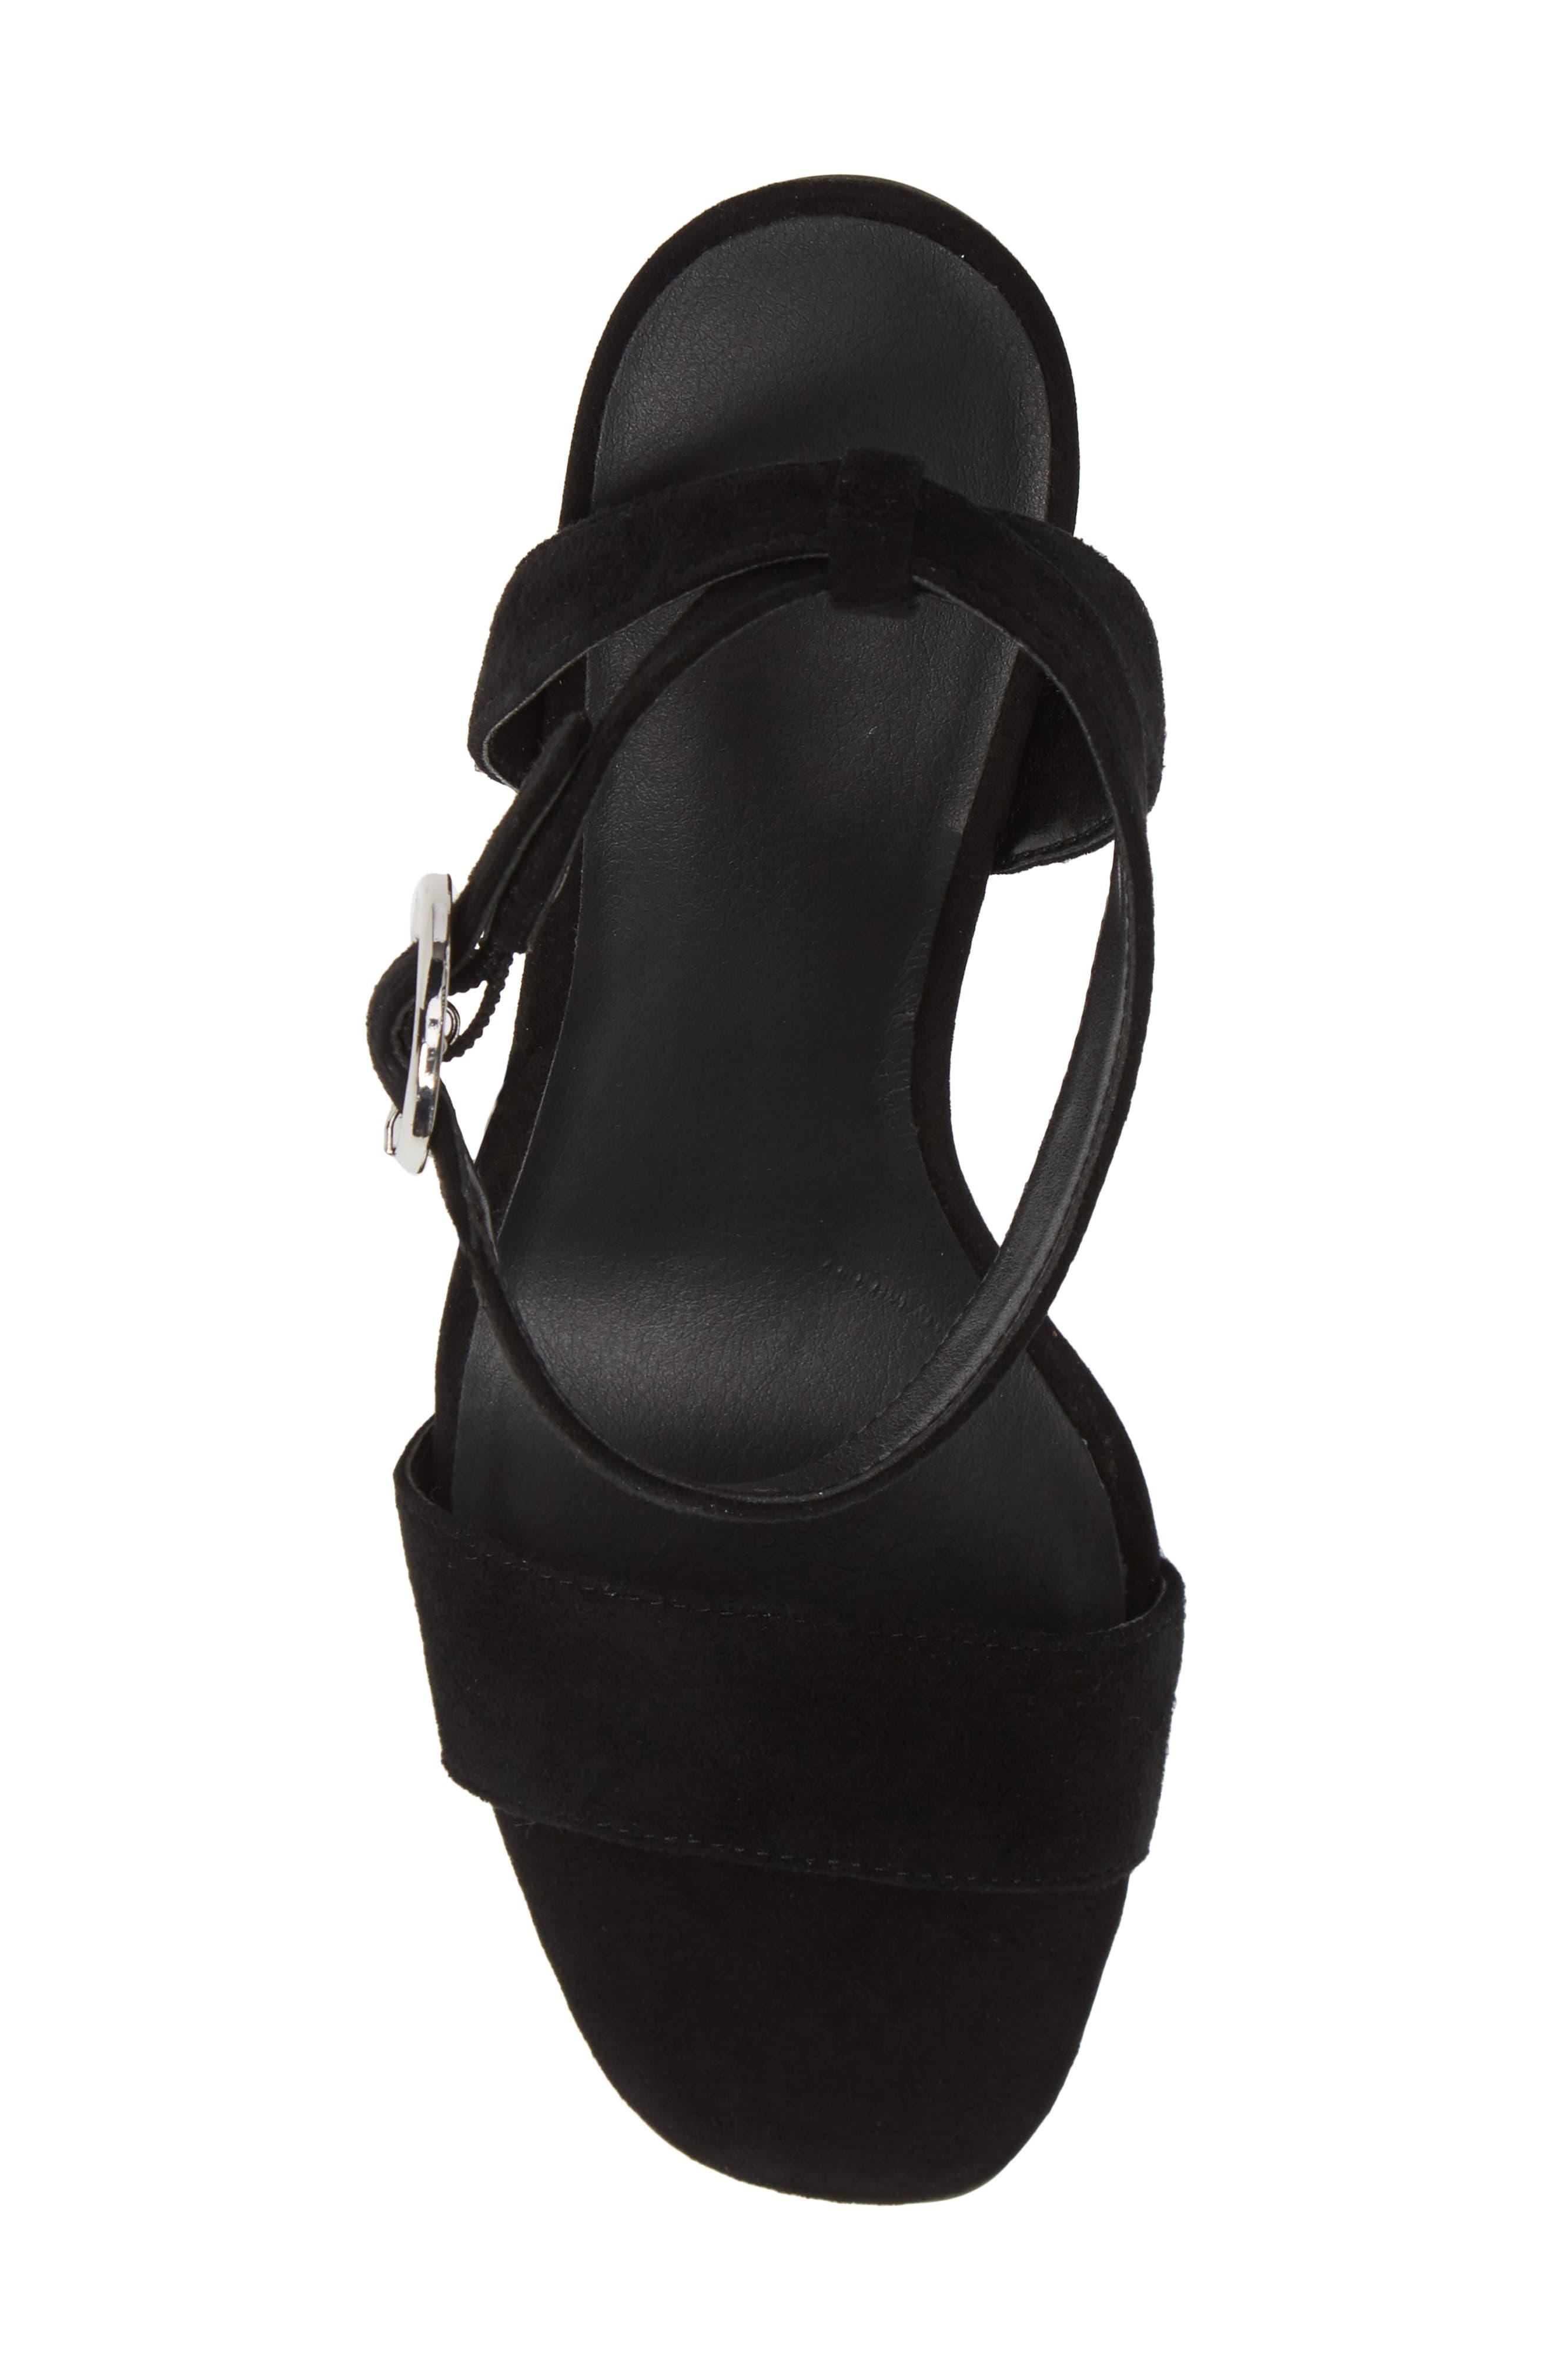 Cleo Cone Heel Sandal,                             Alternate thumbnail 5, color,                             BLACK SUEDE